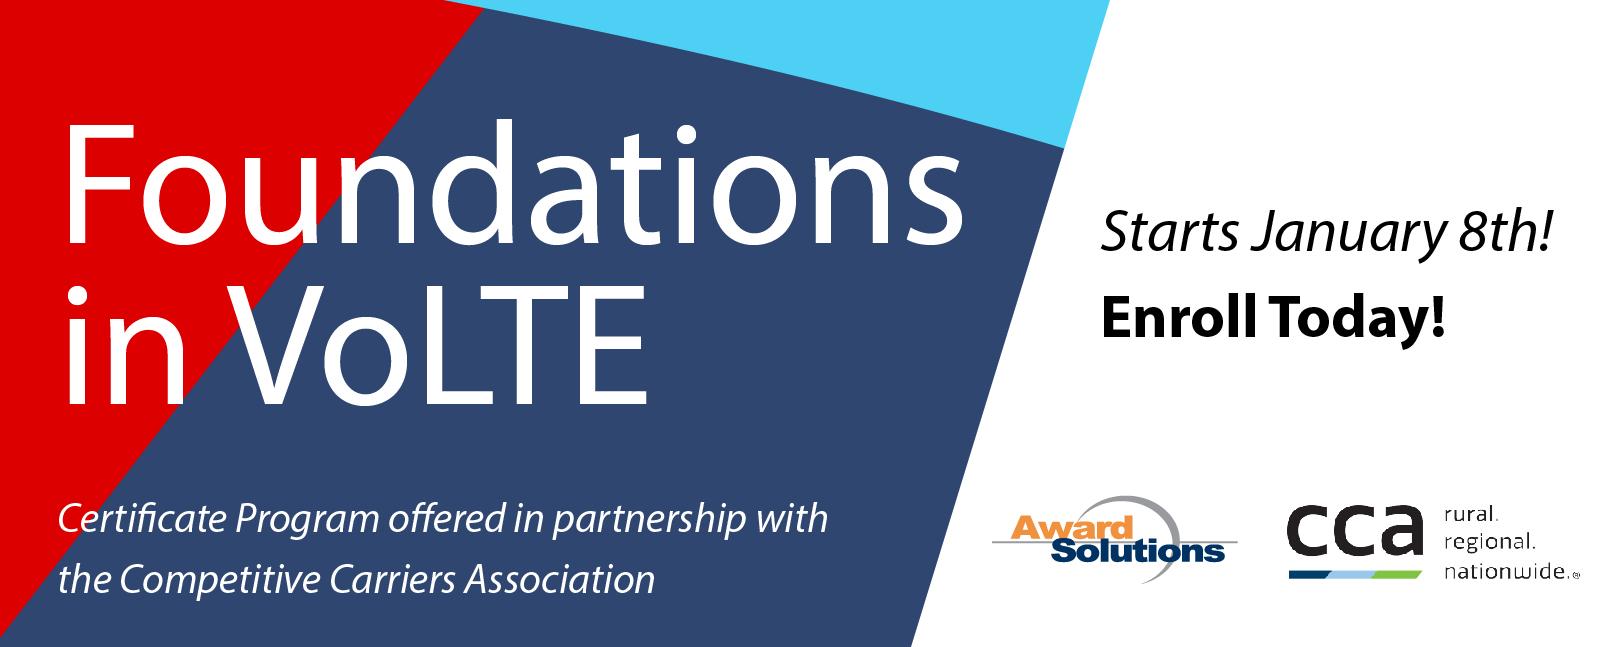 Foundations in VoLTE website 775 x 310-01.jpg